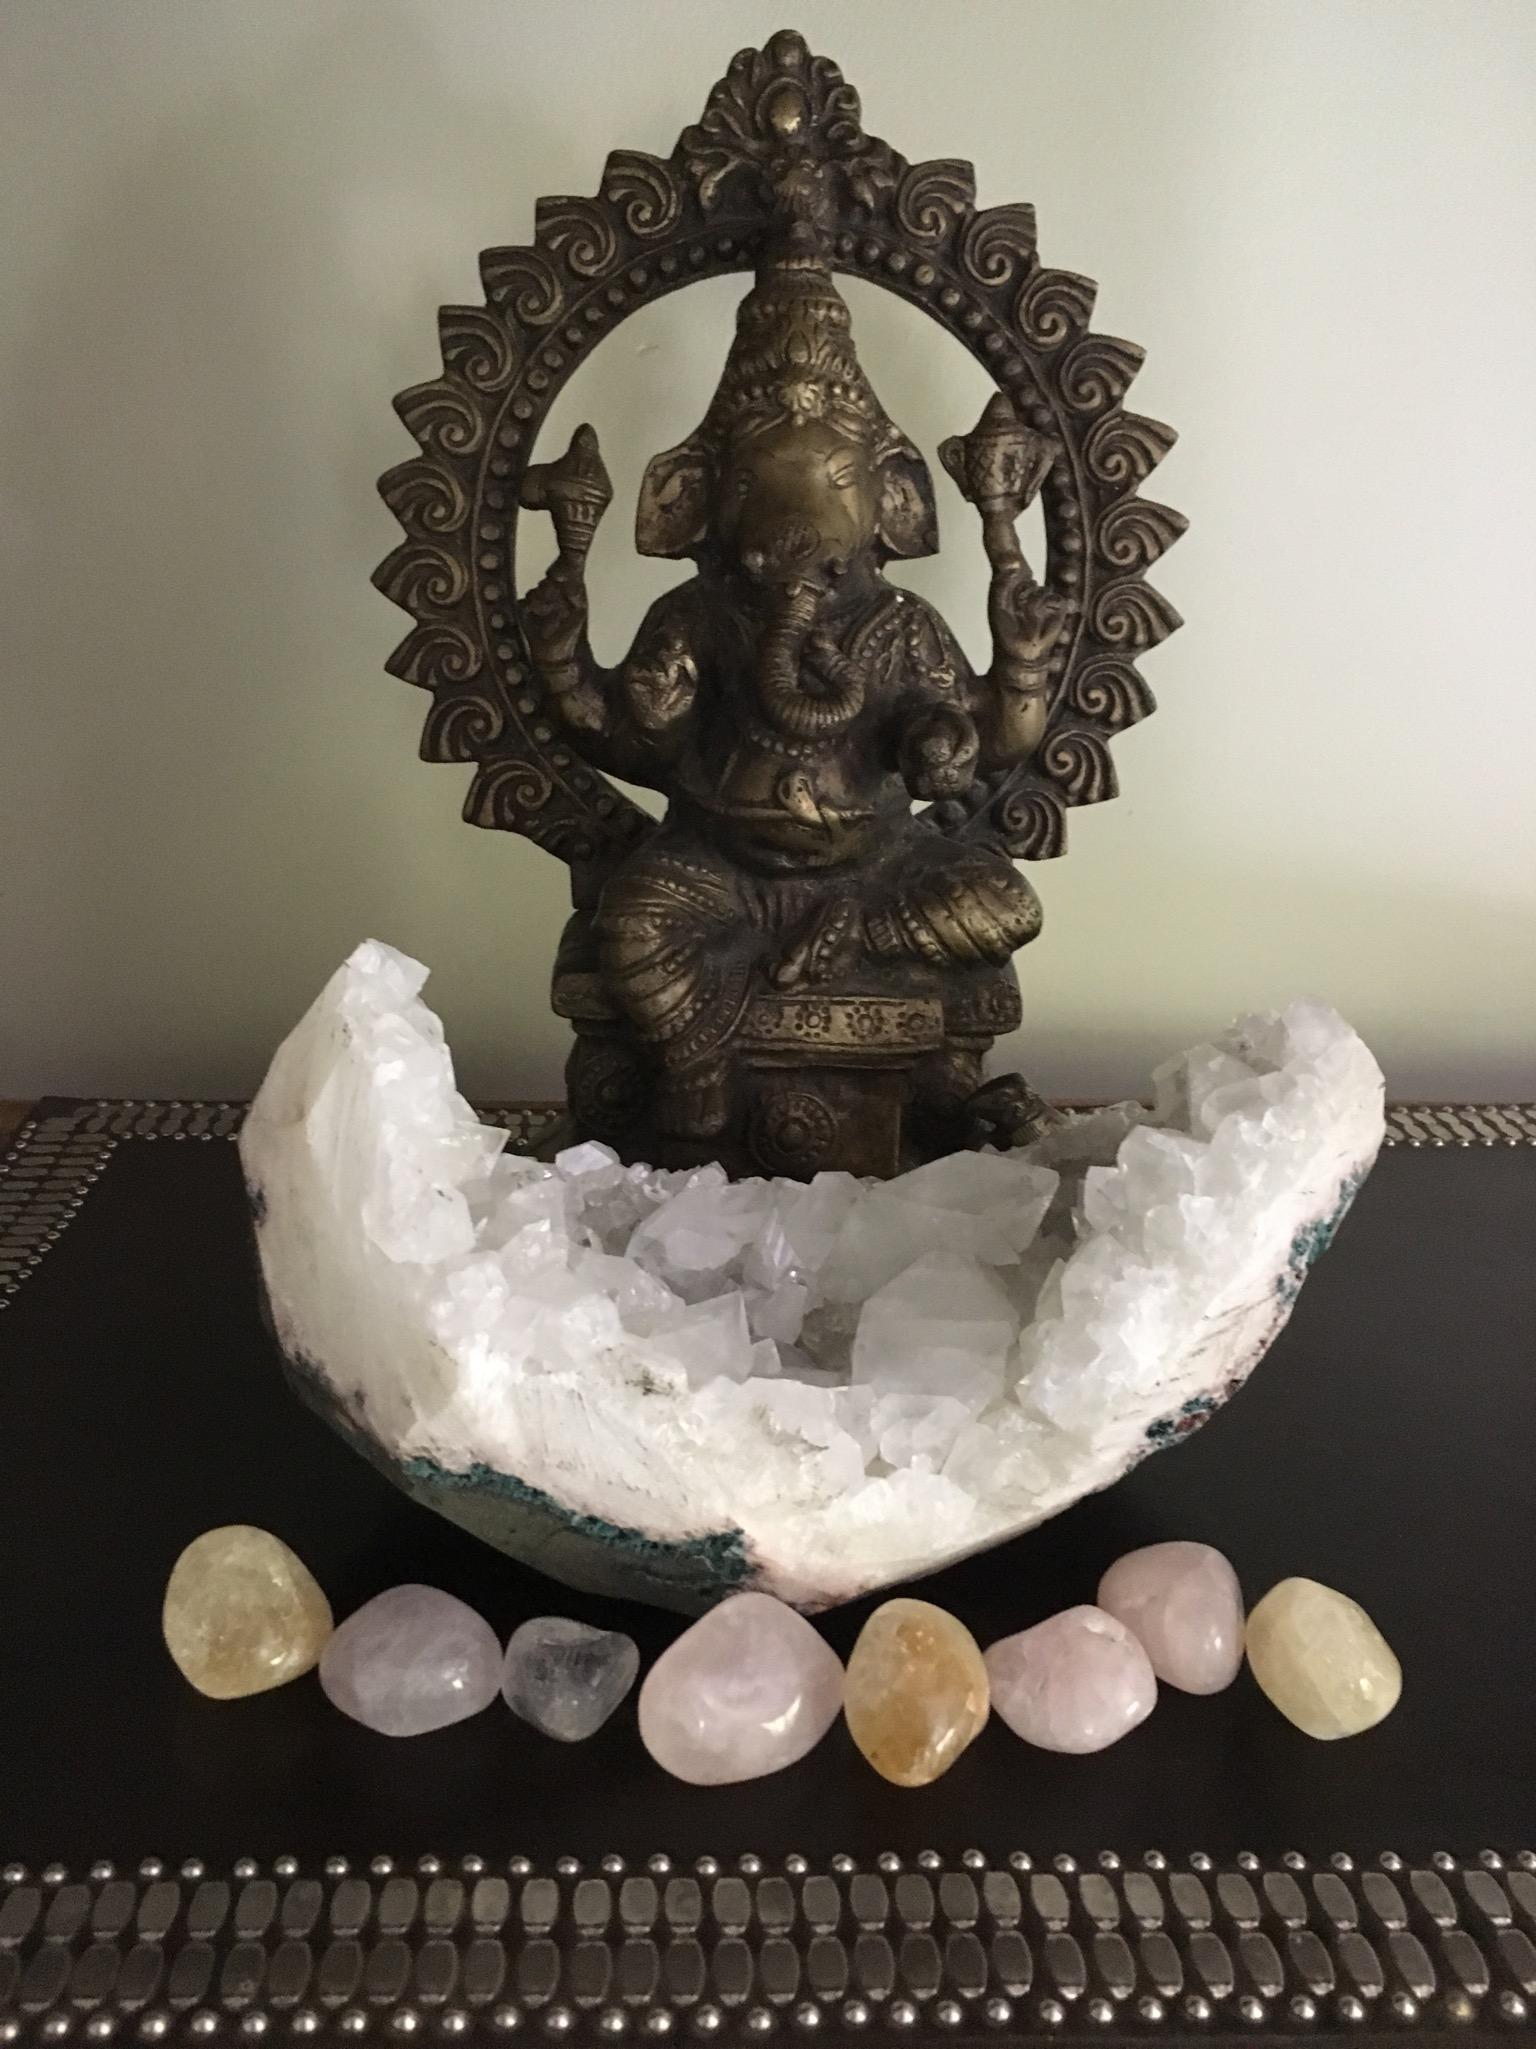 Copy of meditation, healing pain